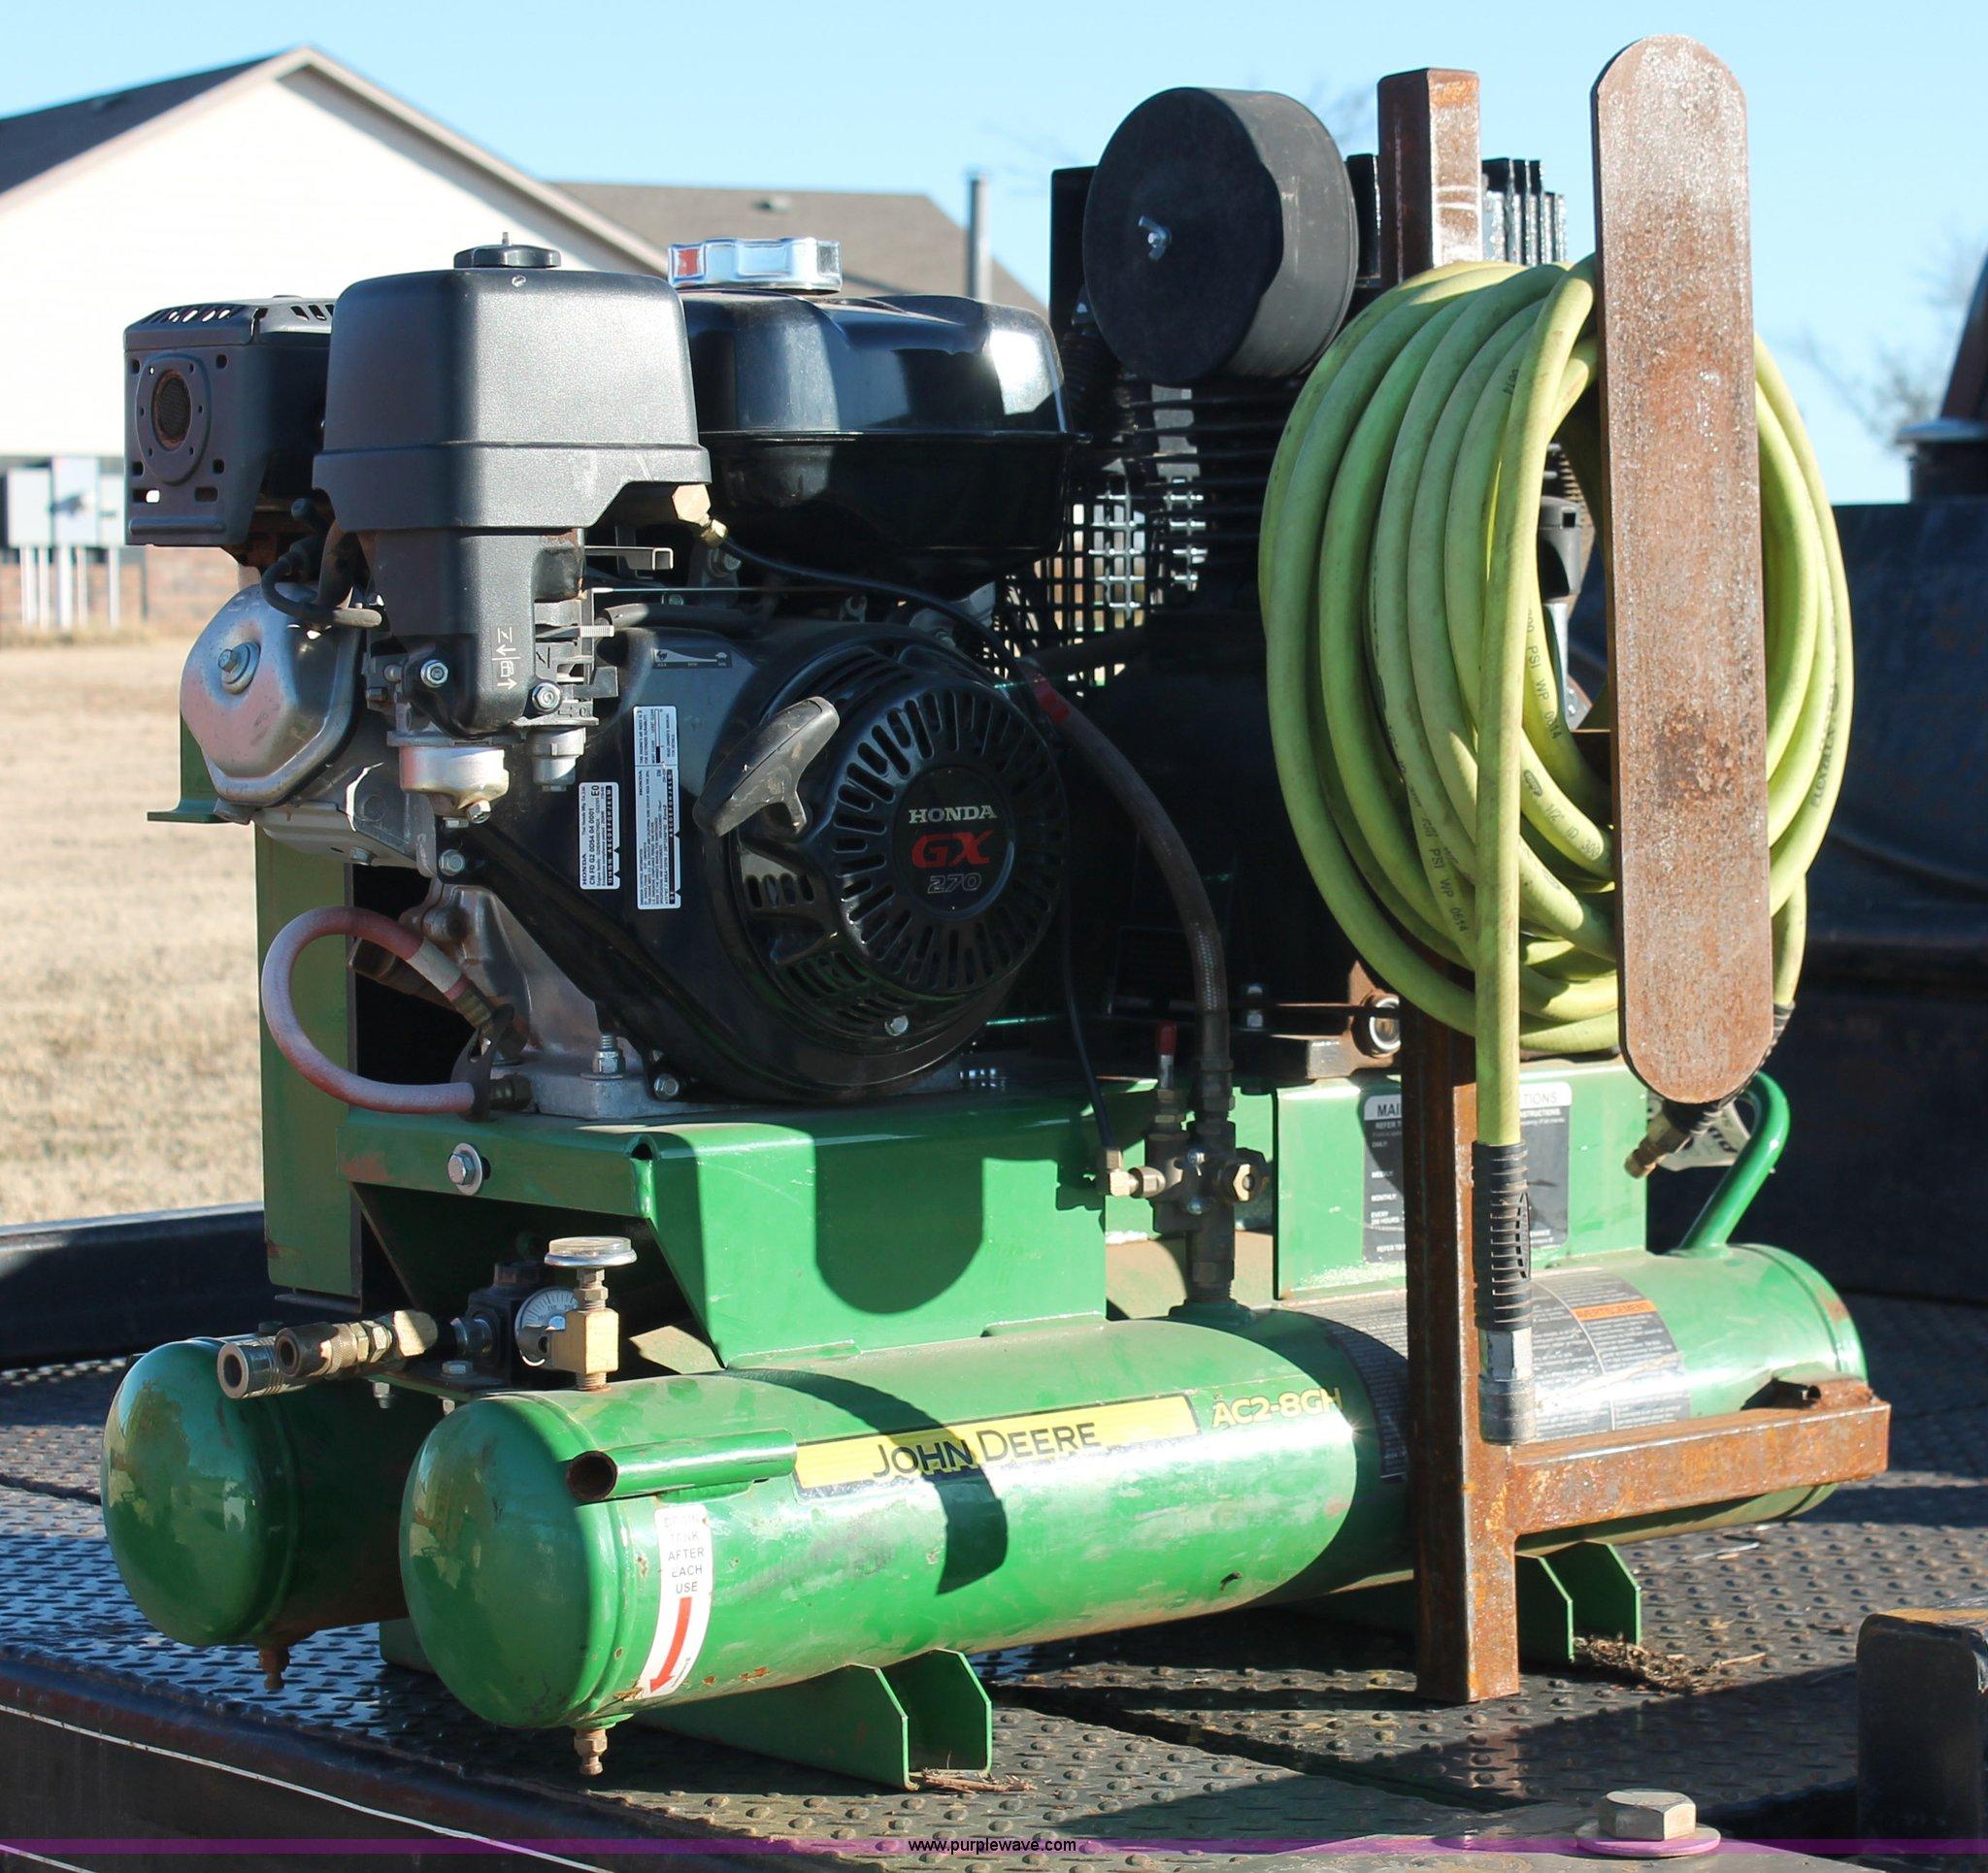 John Deere Air Compressor >> John Deere Ac2 8gh Air Compressor Item H8010 Sold Decem